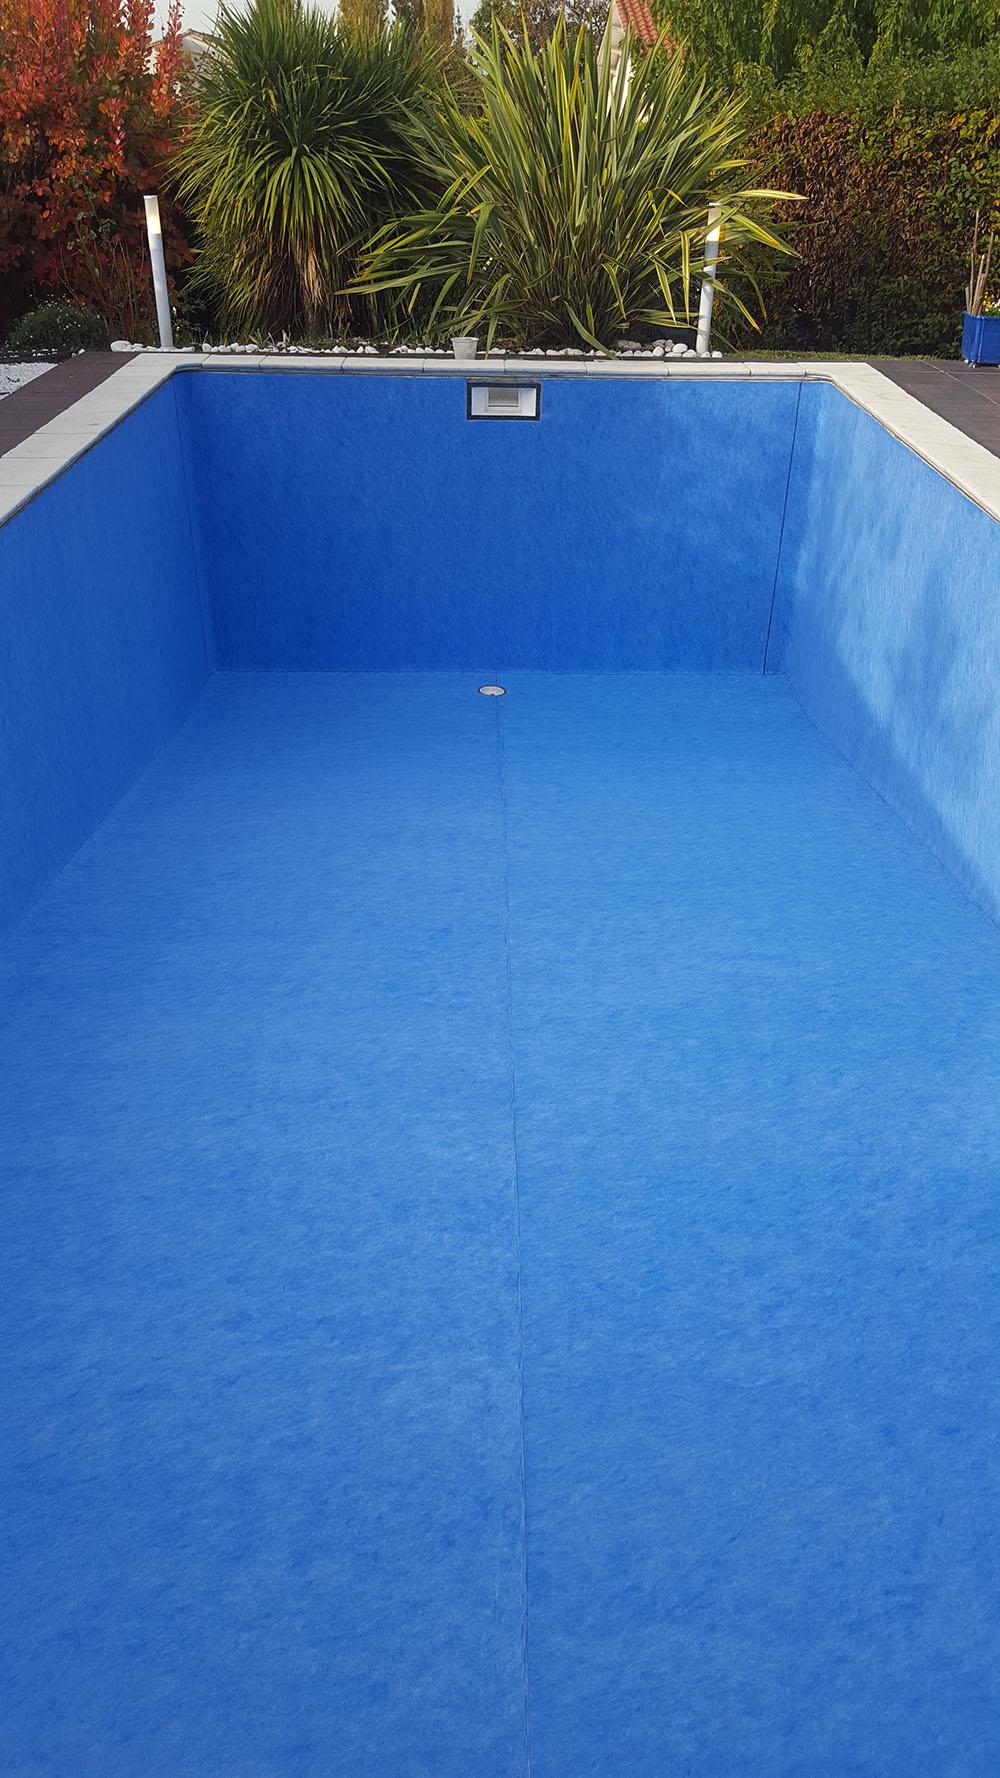 Liner de piscine les horizons bleus for Piscine lormont